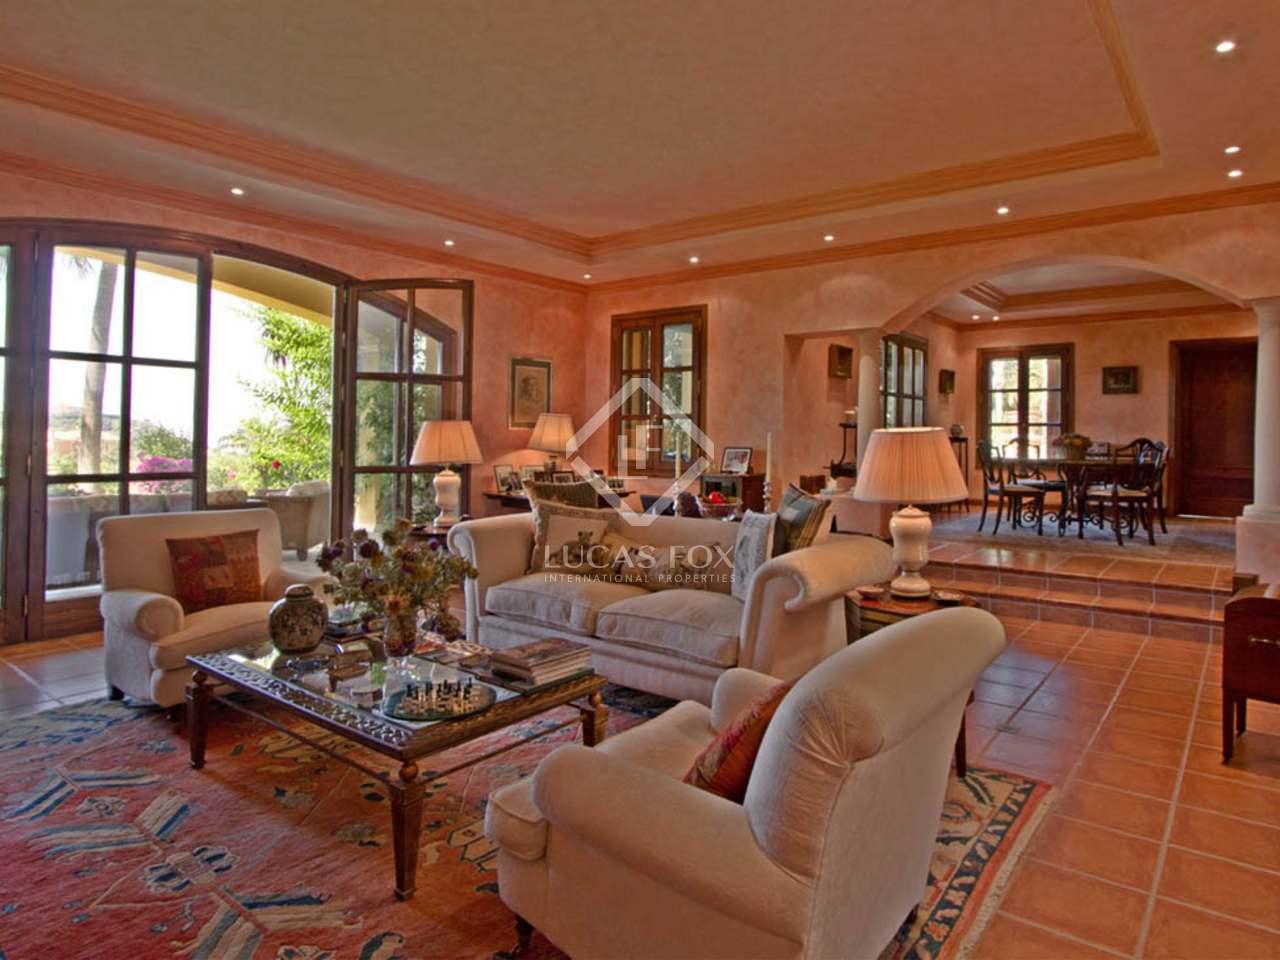 488m haus villa mit 65m terrasse zum verkauf in la zagaleta. Black Bedroom Furniture Sets. Home Design Ideas